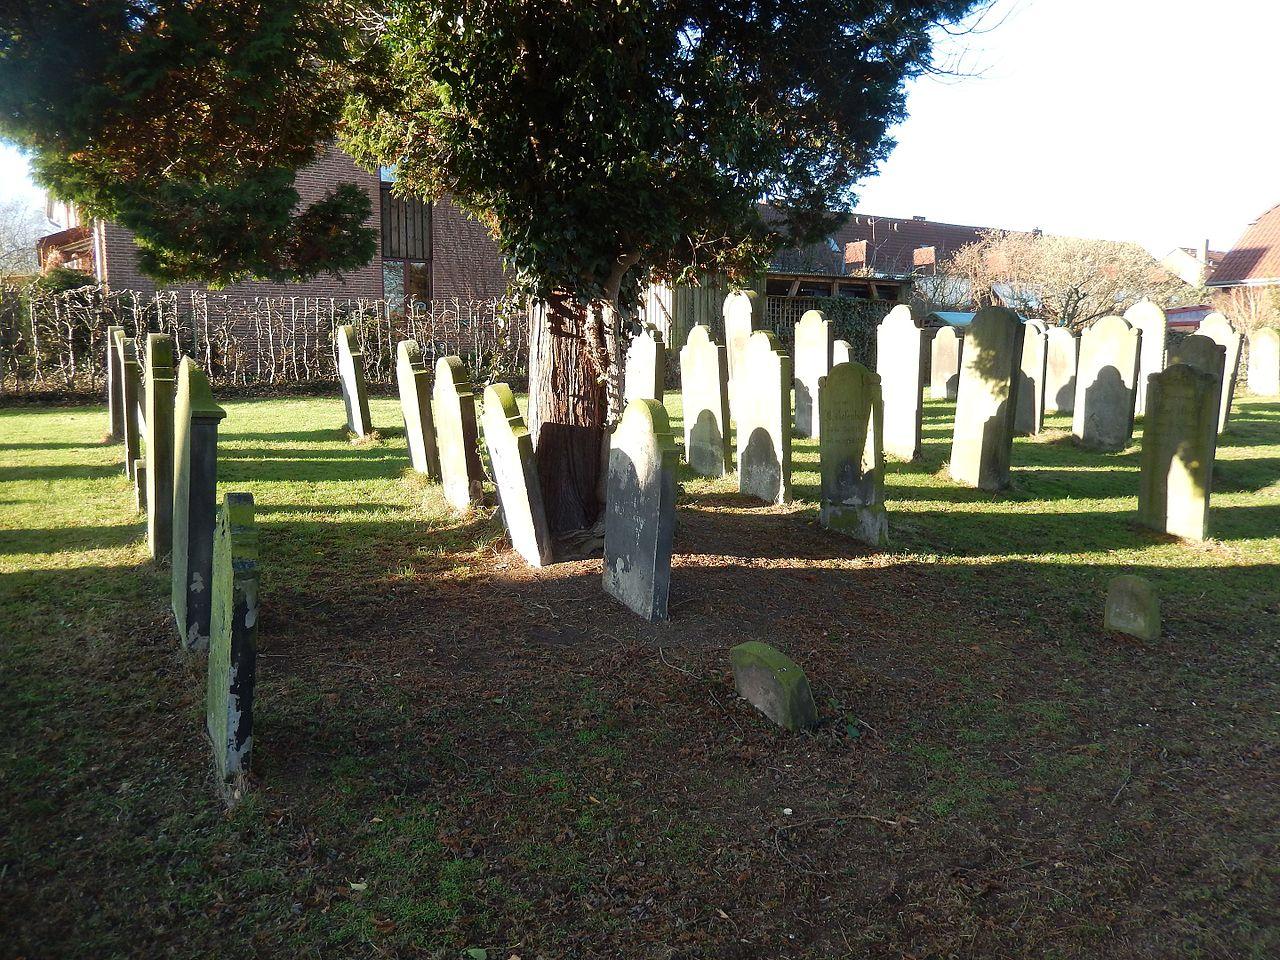 Jüdischer Friedhof Wunstorf 03.jpg